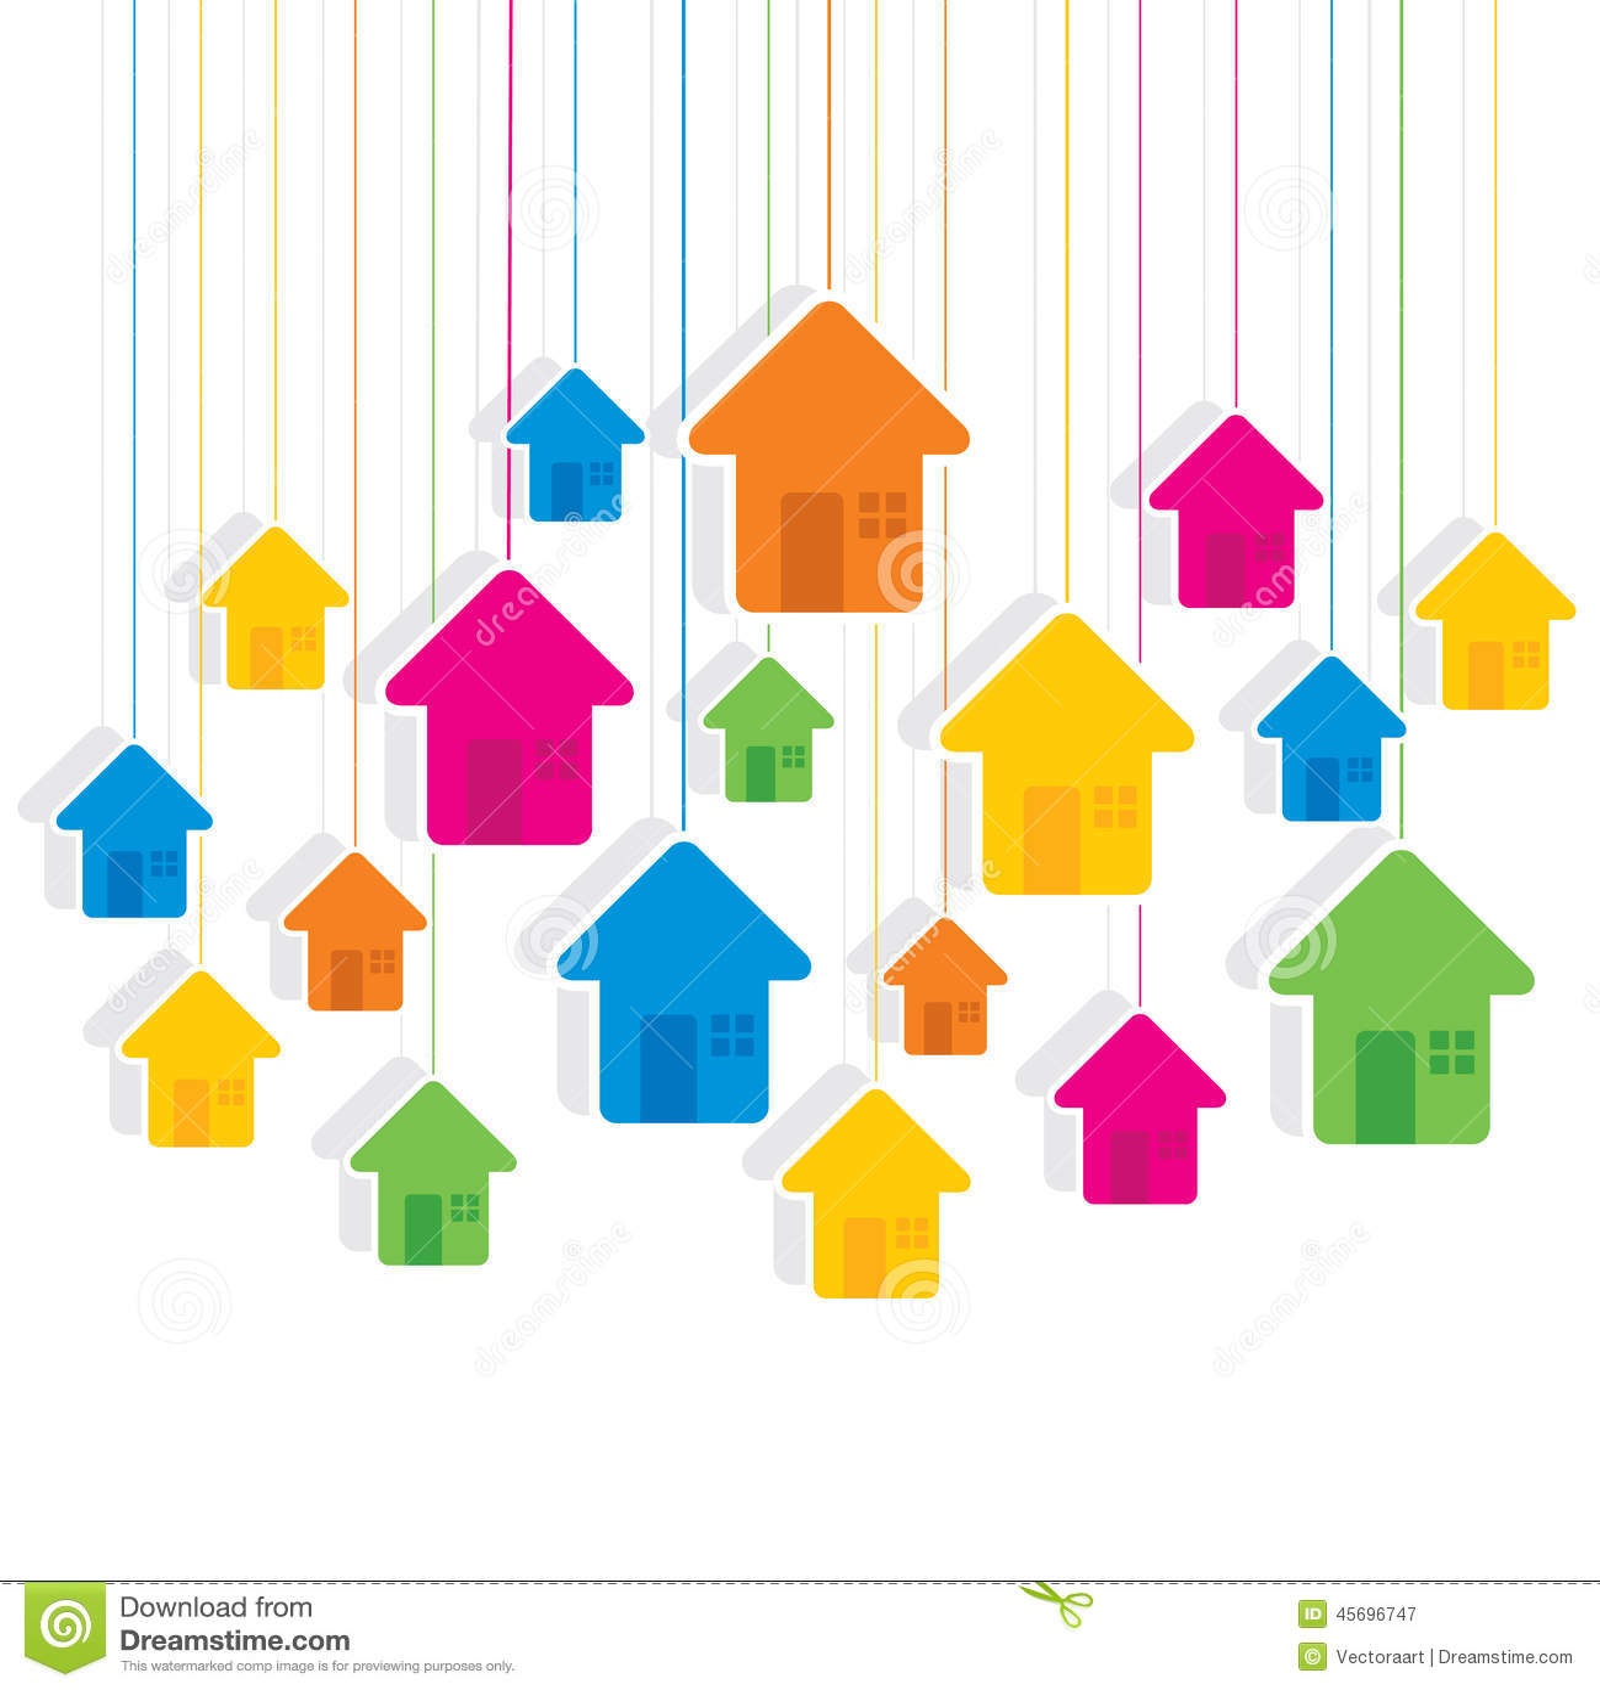 House Design Patterns Patterns Kid